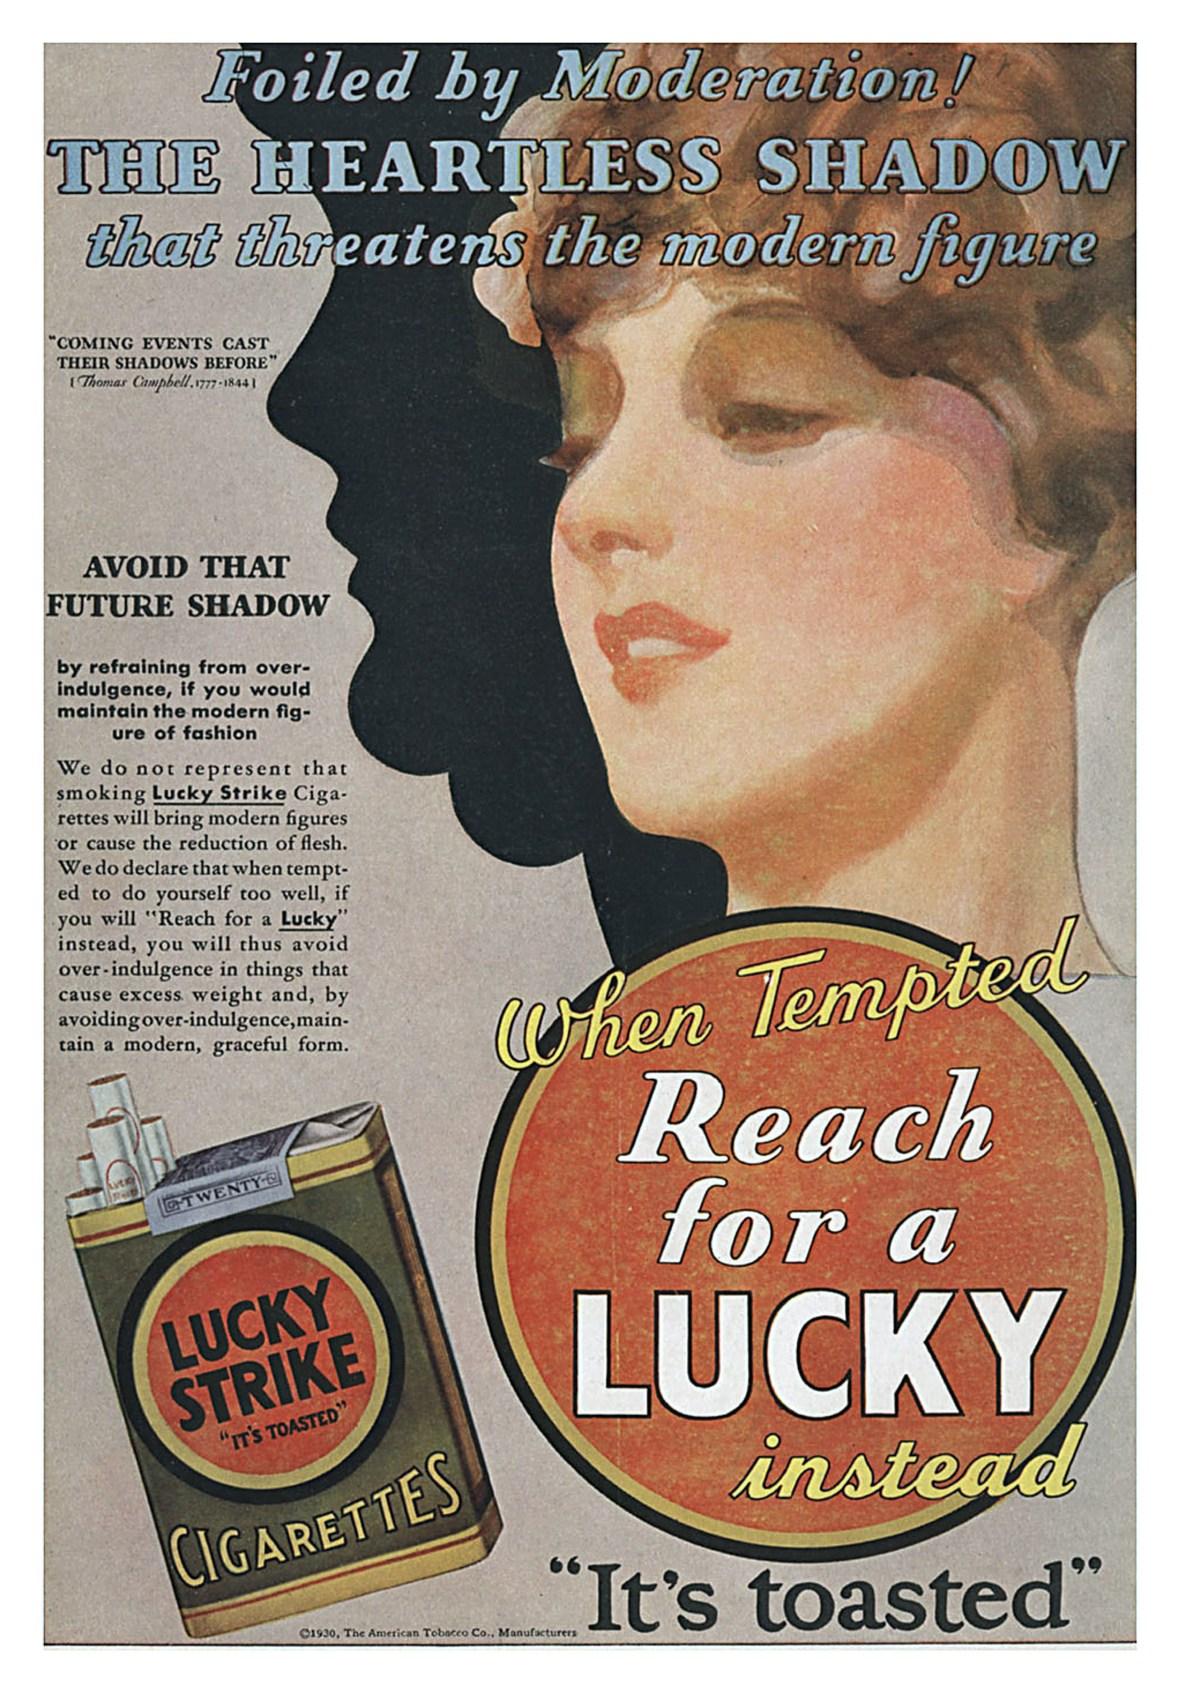 Lucky Strike Cigarettes - 1930